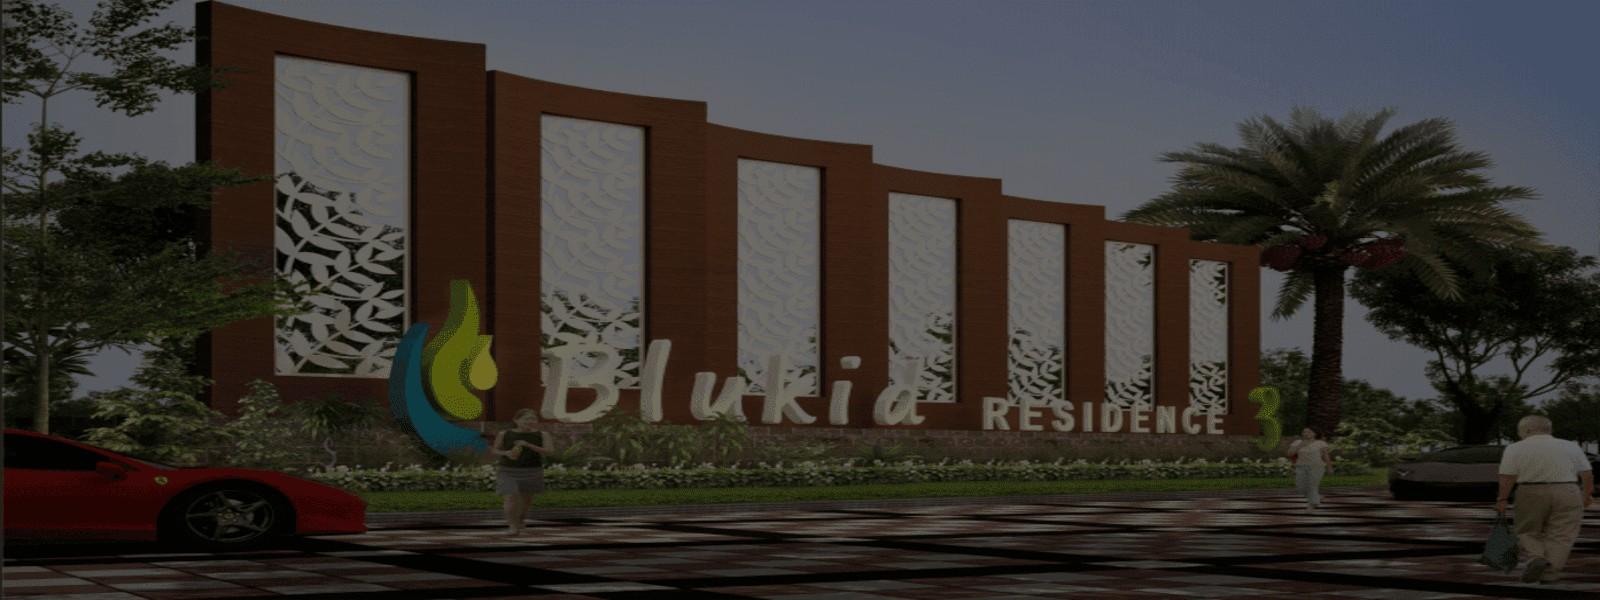 Blukid Residence 3 Banner Dekstop